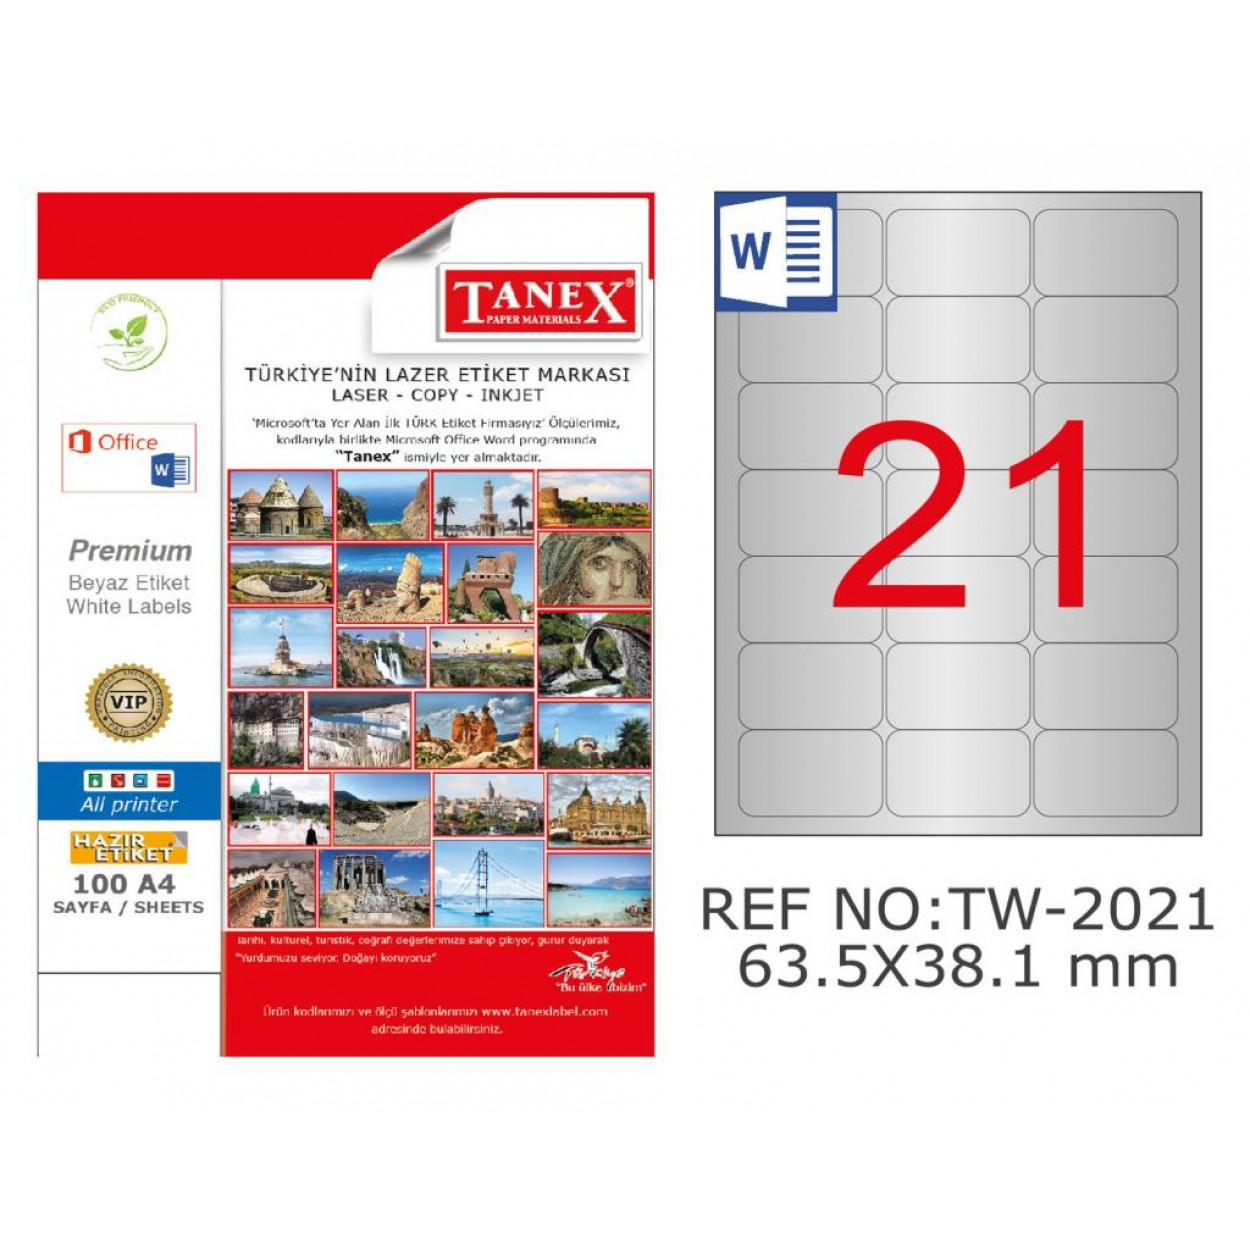 Tanex TW-2021 65.5x38.1 mm Gümüş Lazer Etiket 525 Li